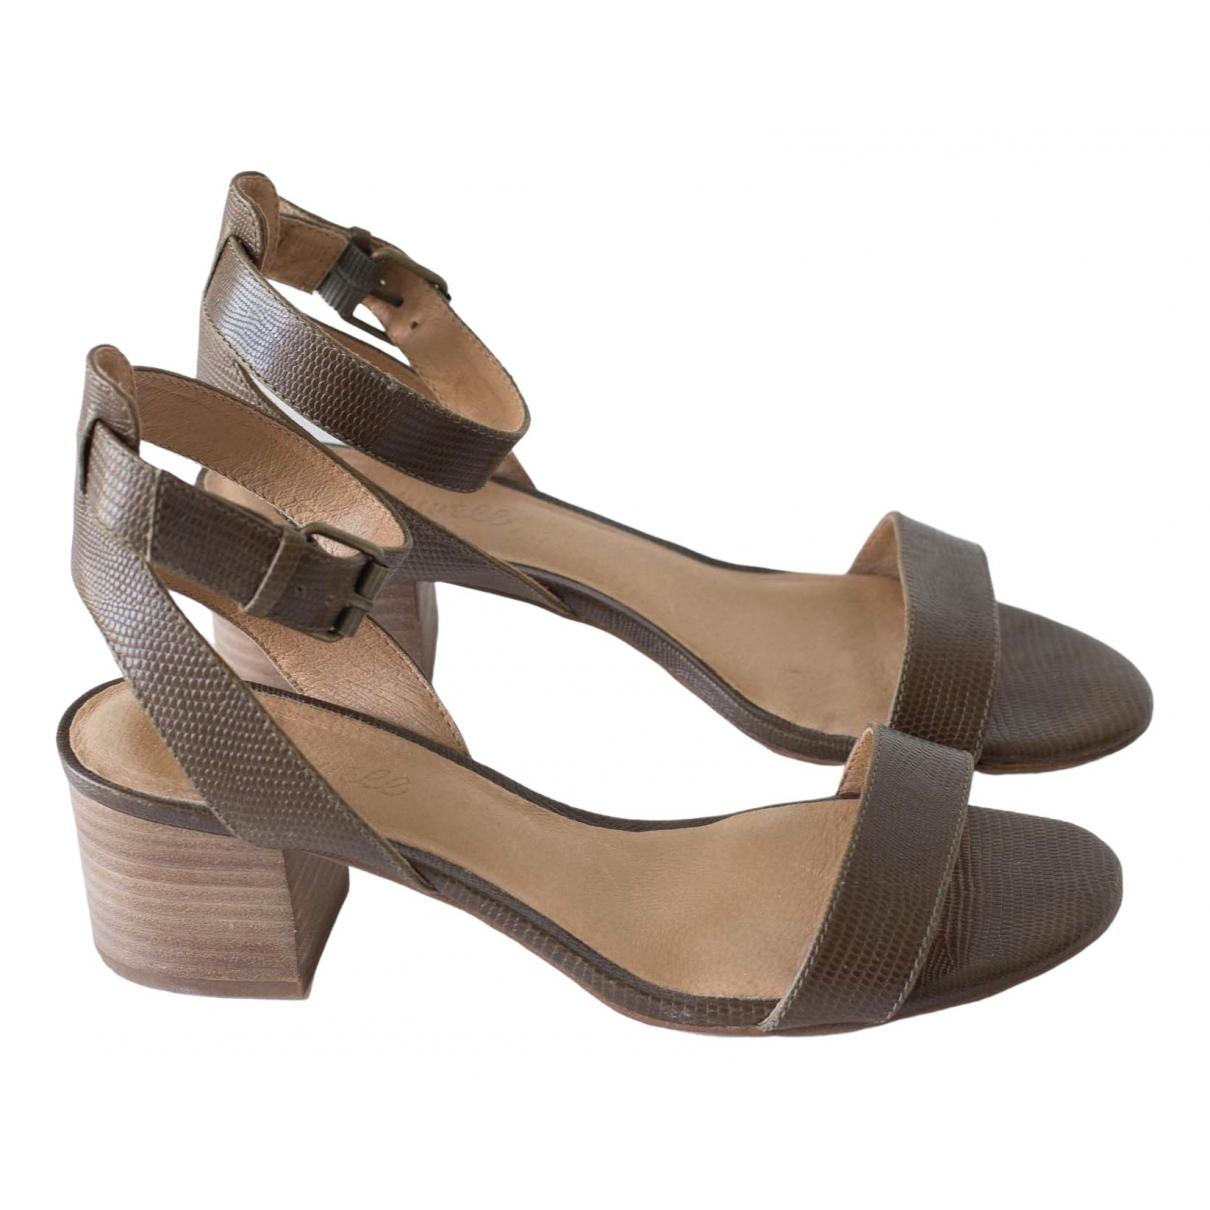 Sandalias romanas de Cuero Madewell